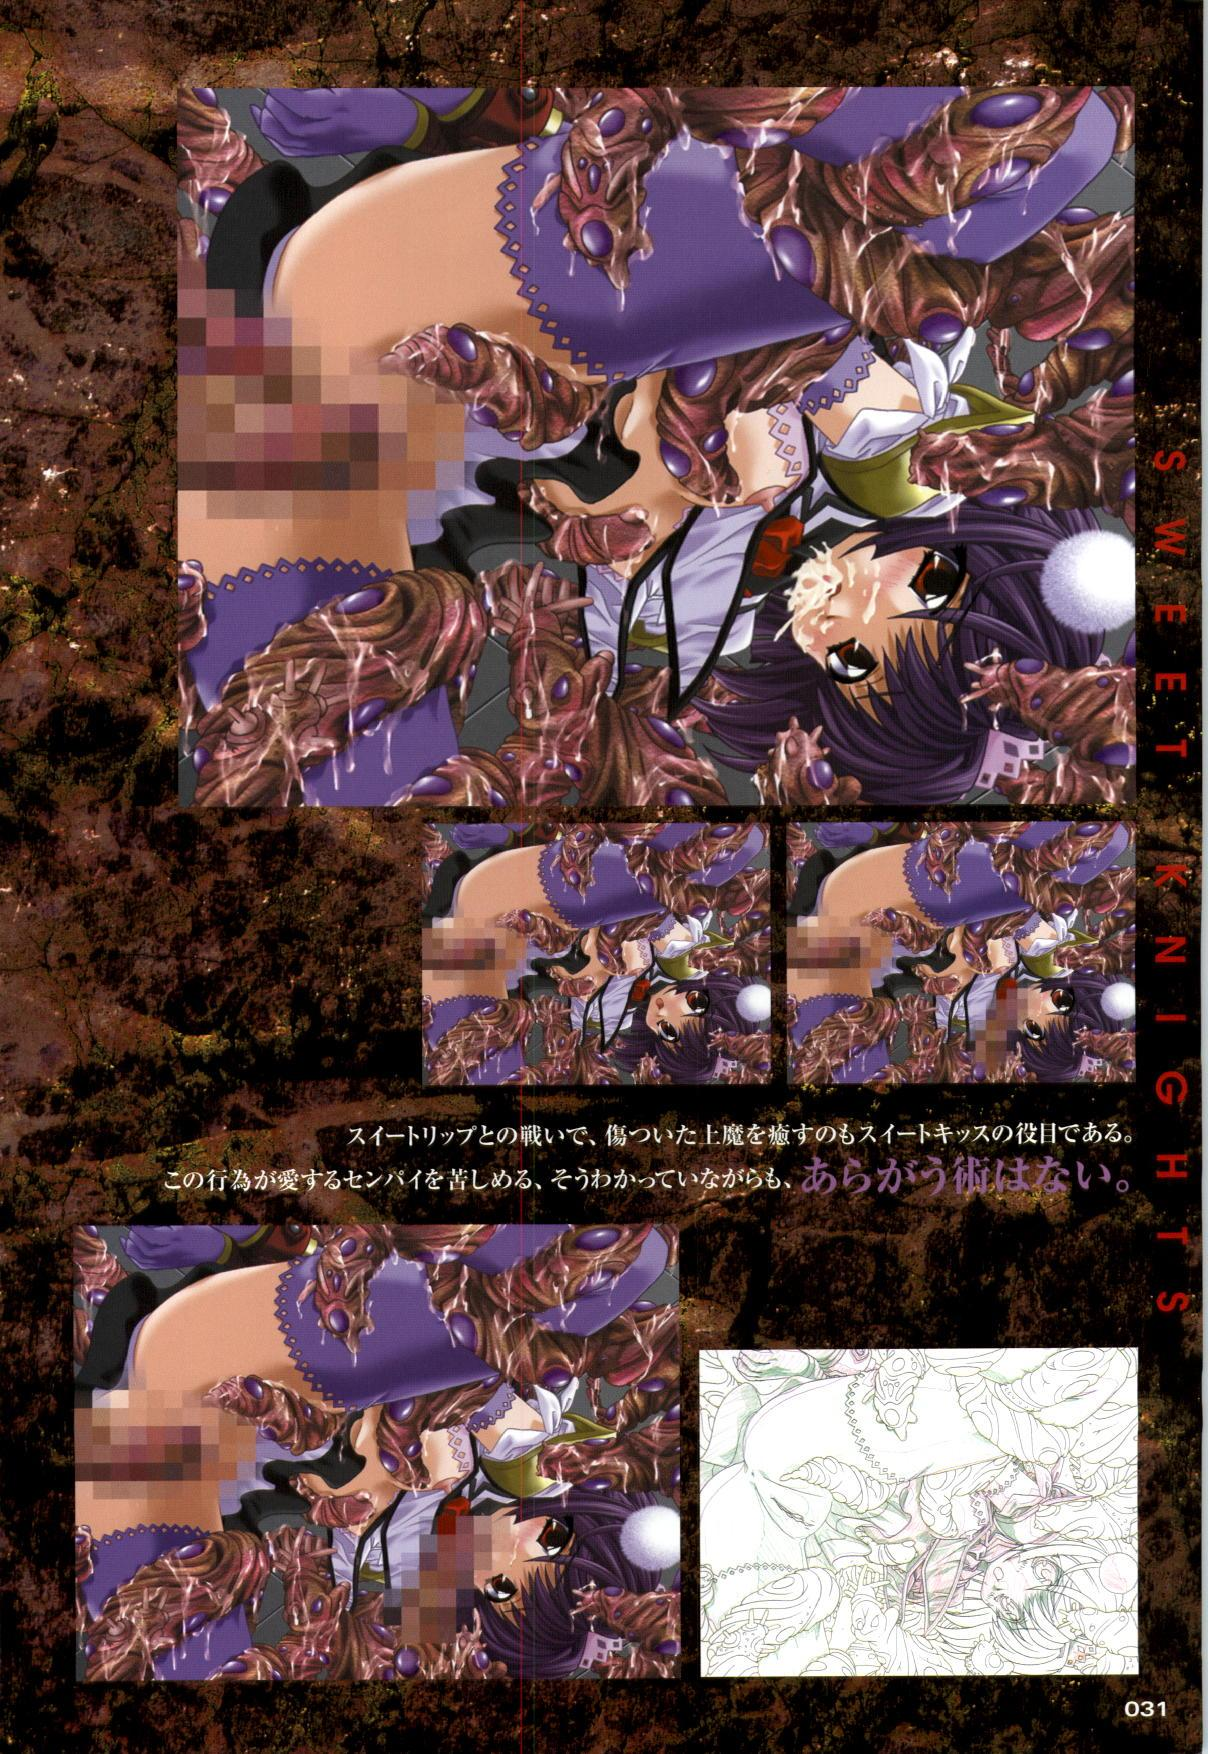 Mahou Senshi Sweet Knight & Mahou Senshi Princess Tear 30